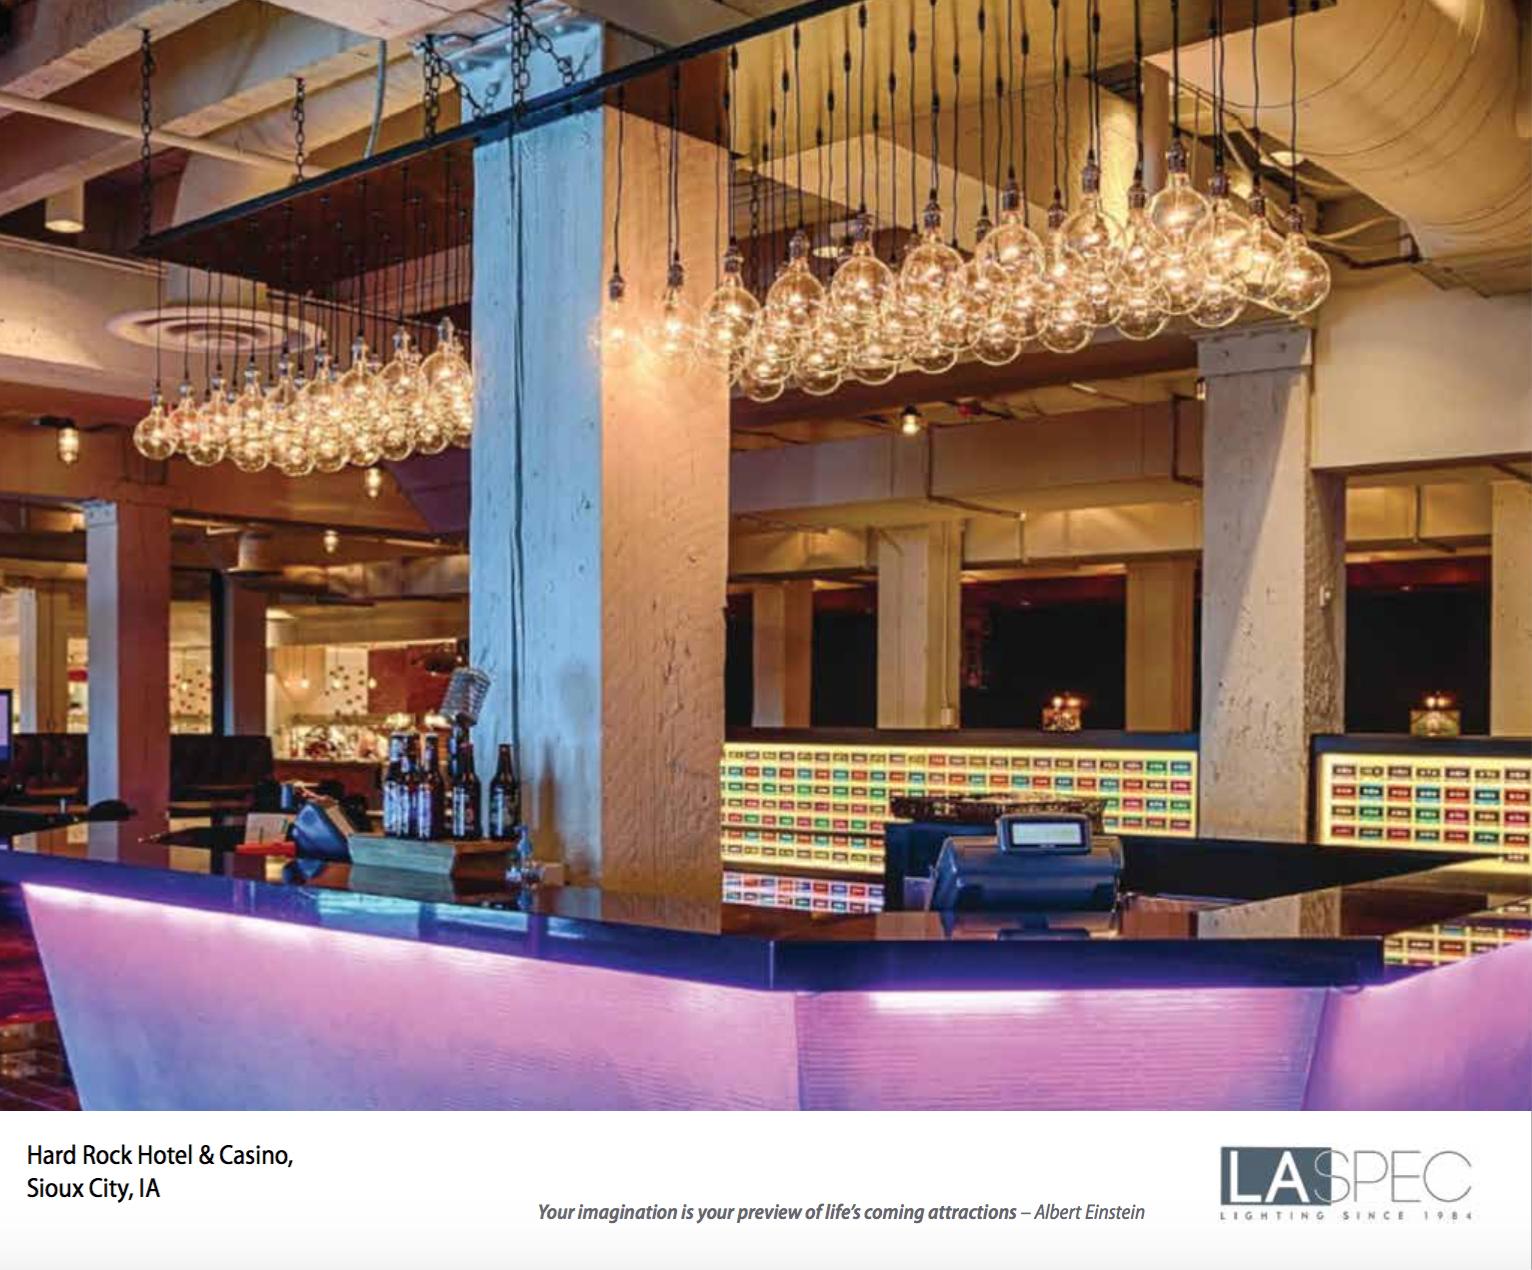 Custom Lighting By Laspec For Hard Rock Hotel And Casino Sioux City Ia Custom Lighting House Styles Hard Rock Hotel